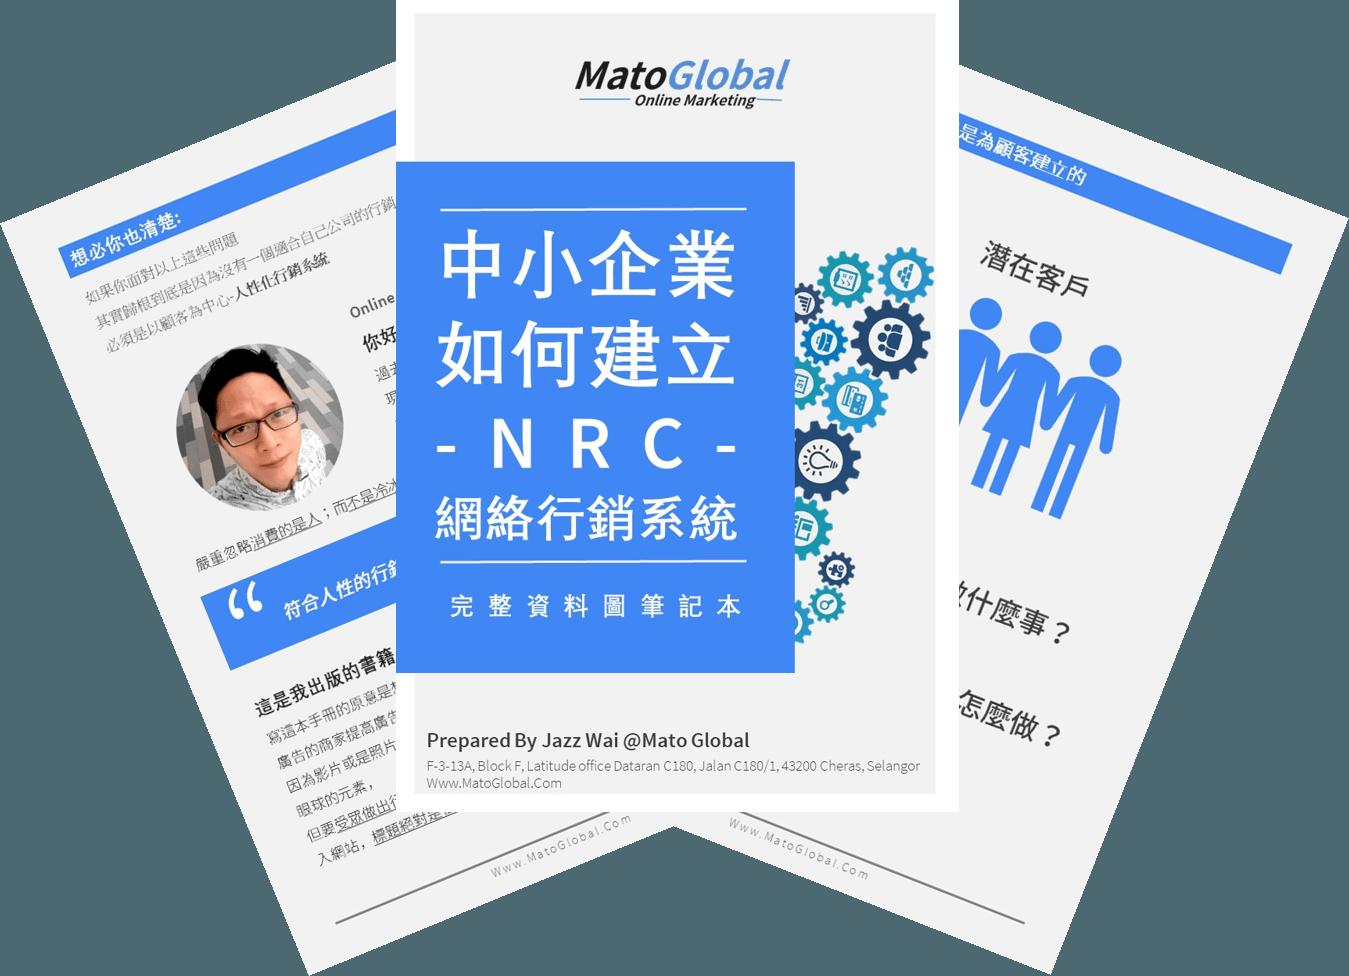 NRC Online Marketing InfoGraphic